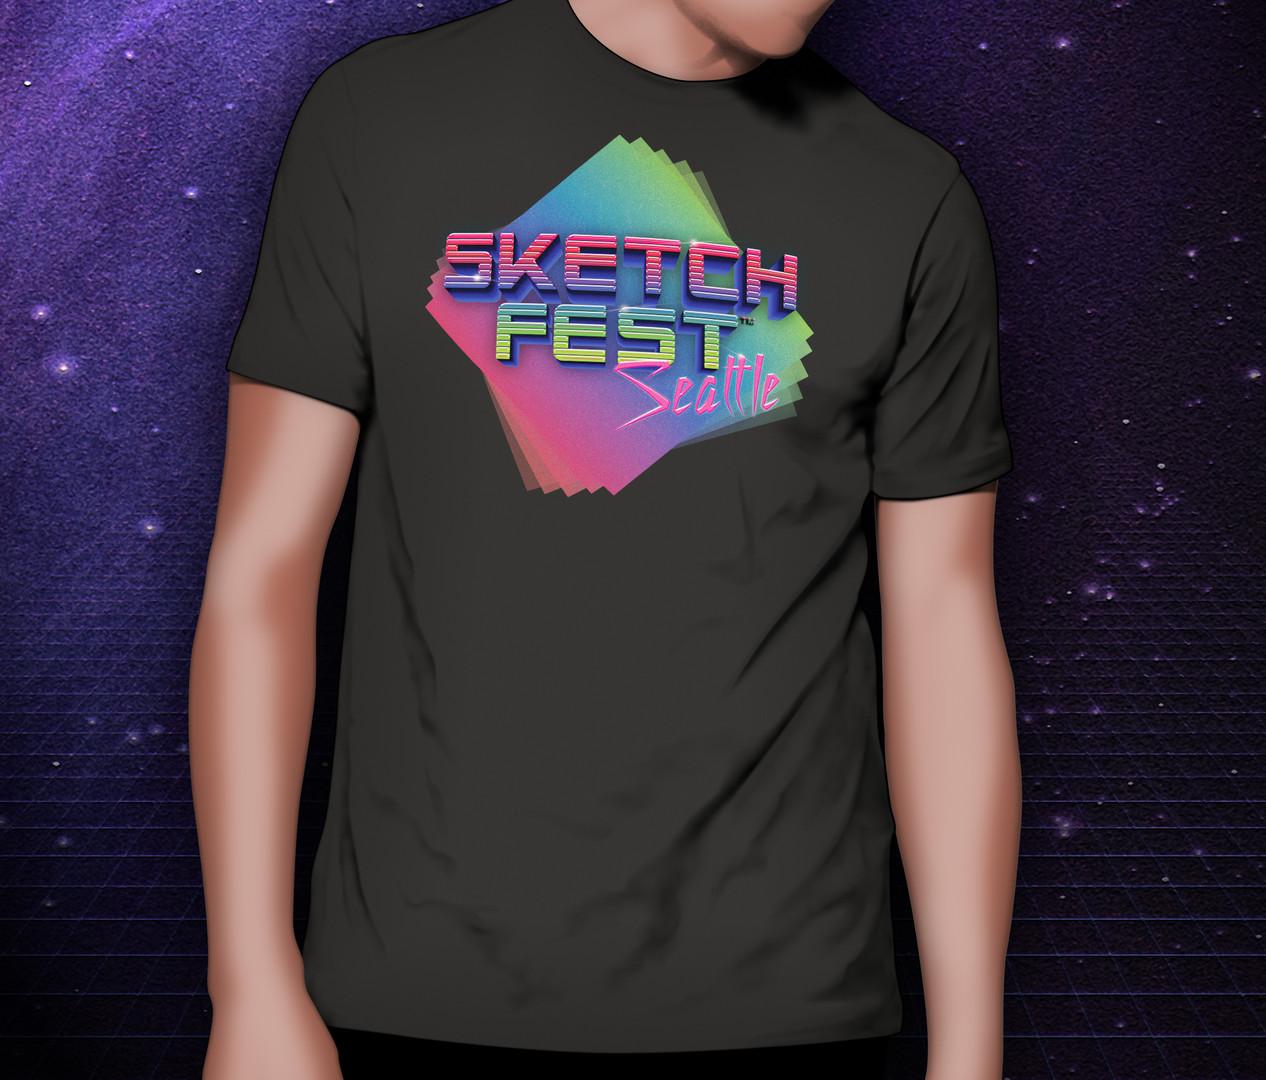 SketchFest Tshirt